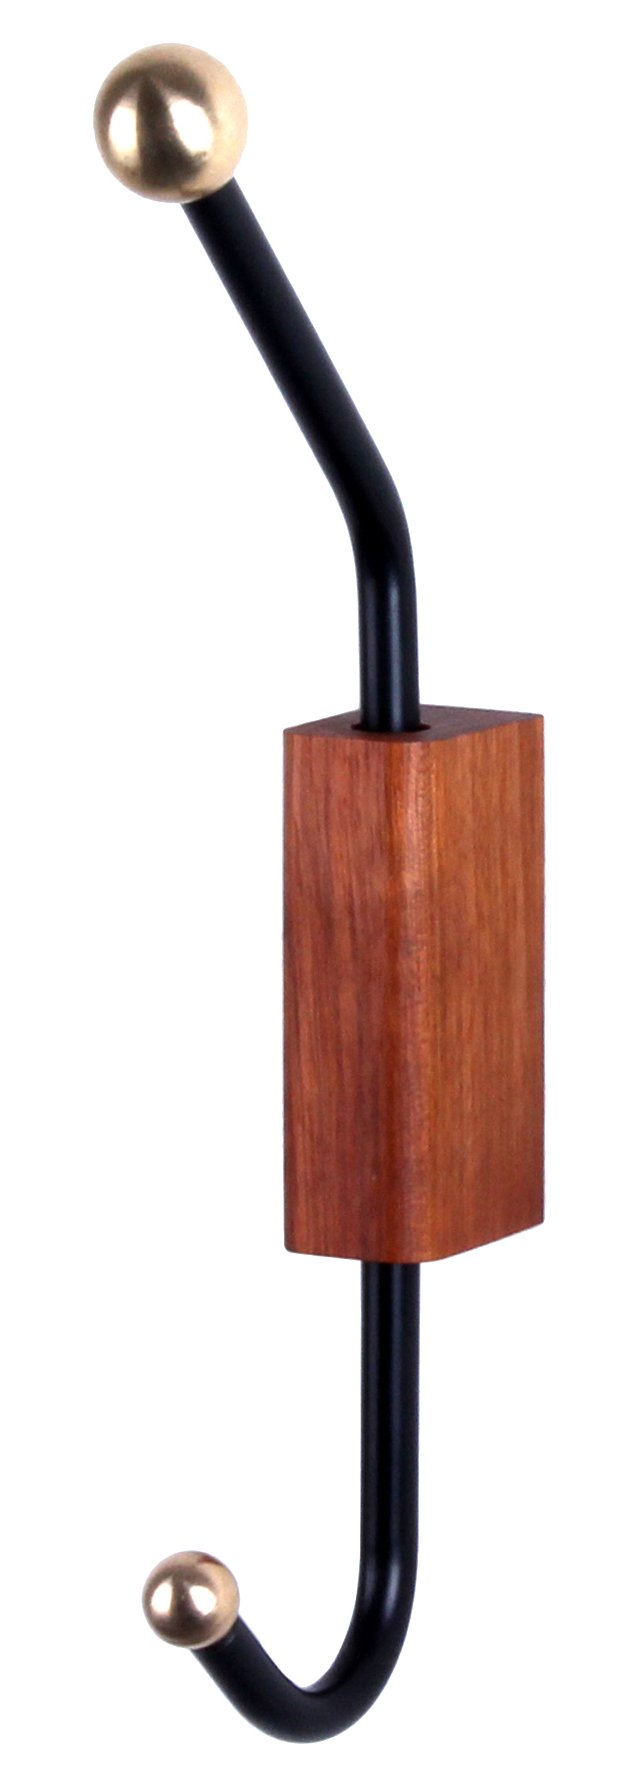 Wood Block Wall Hook, Black